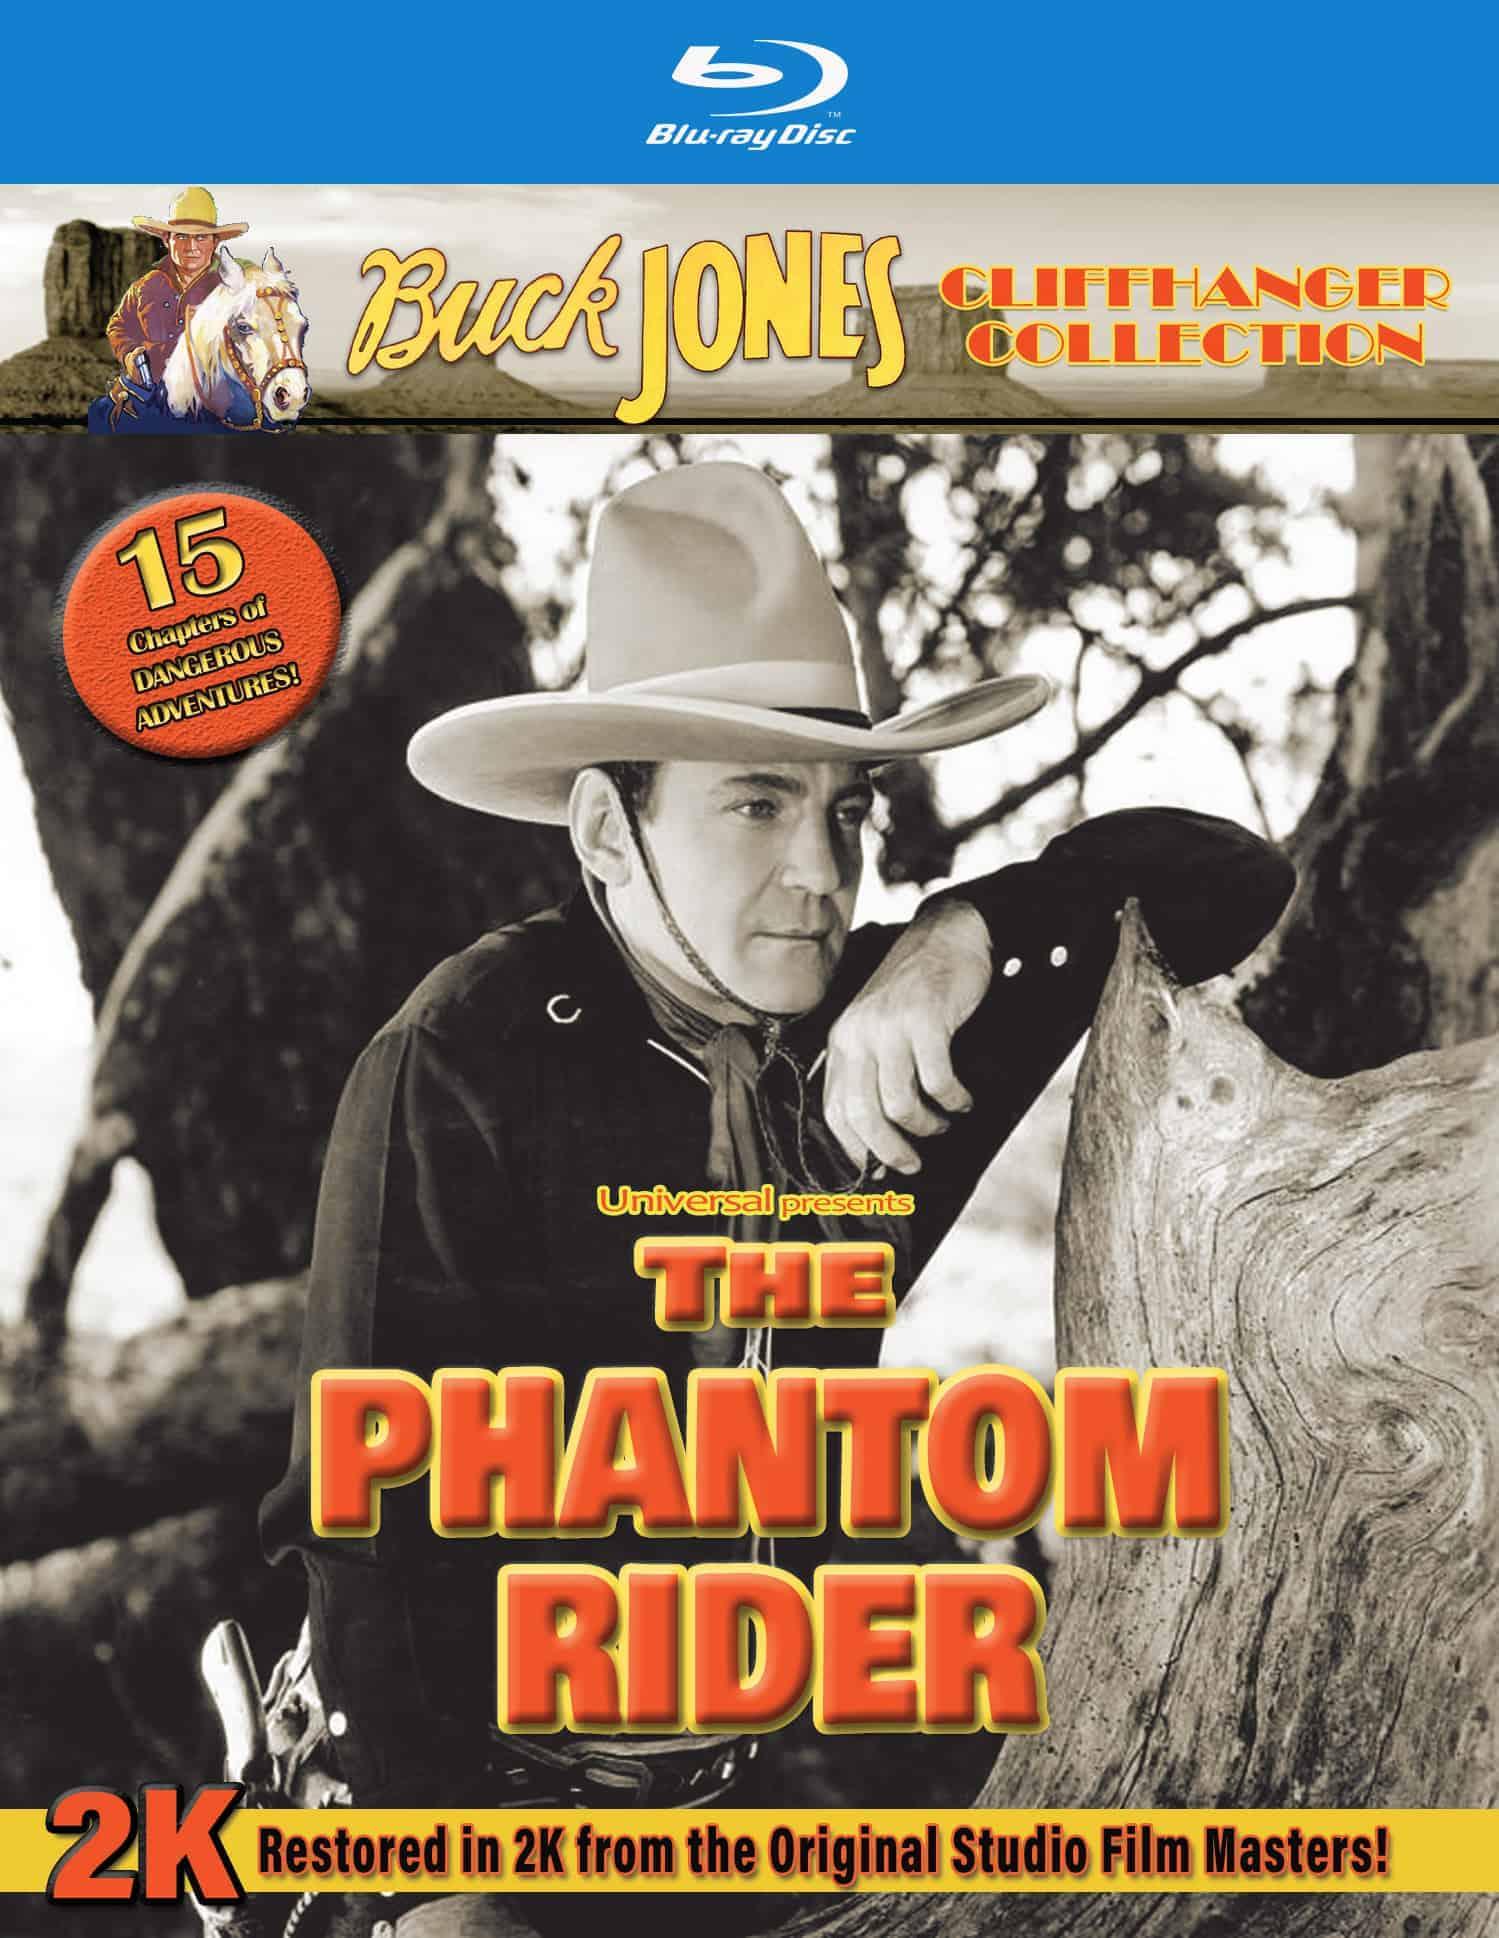 Phantom Rider blu ray